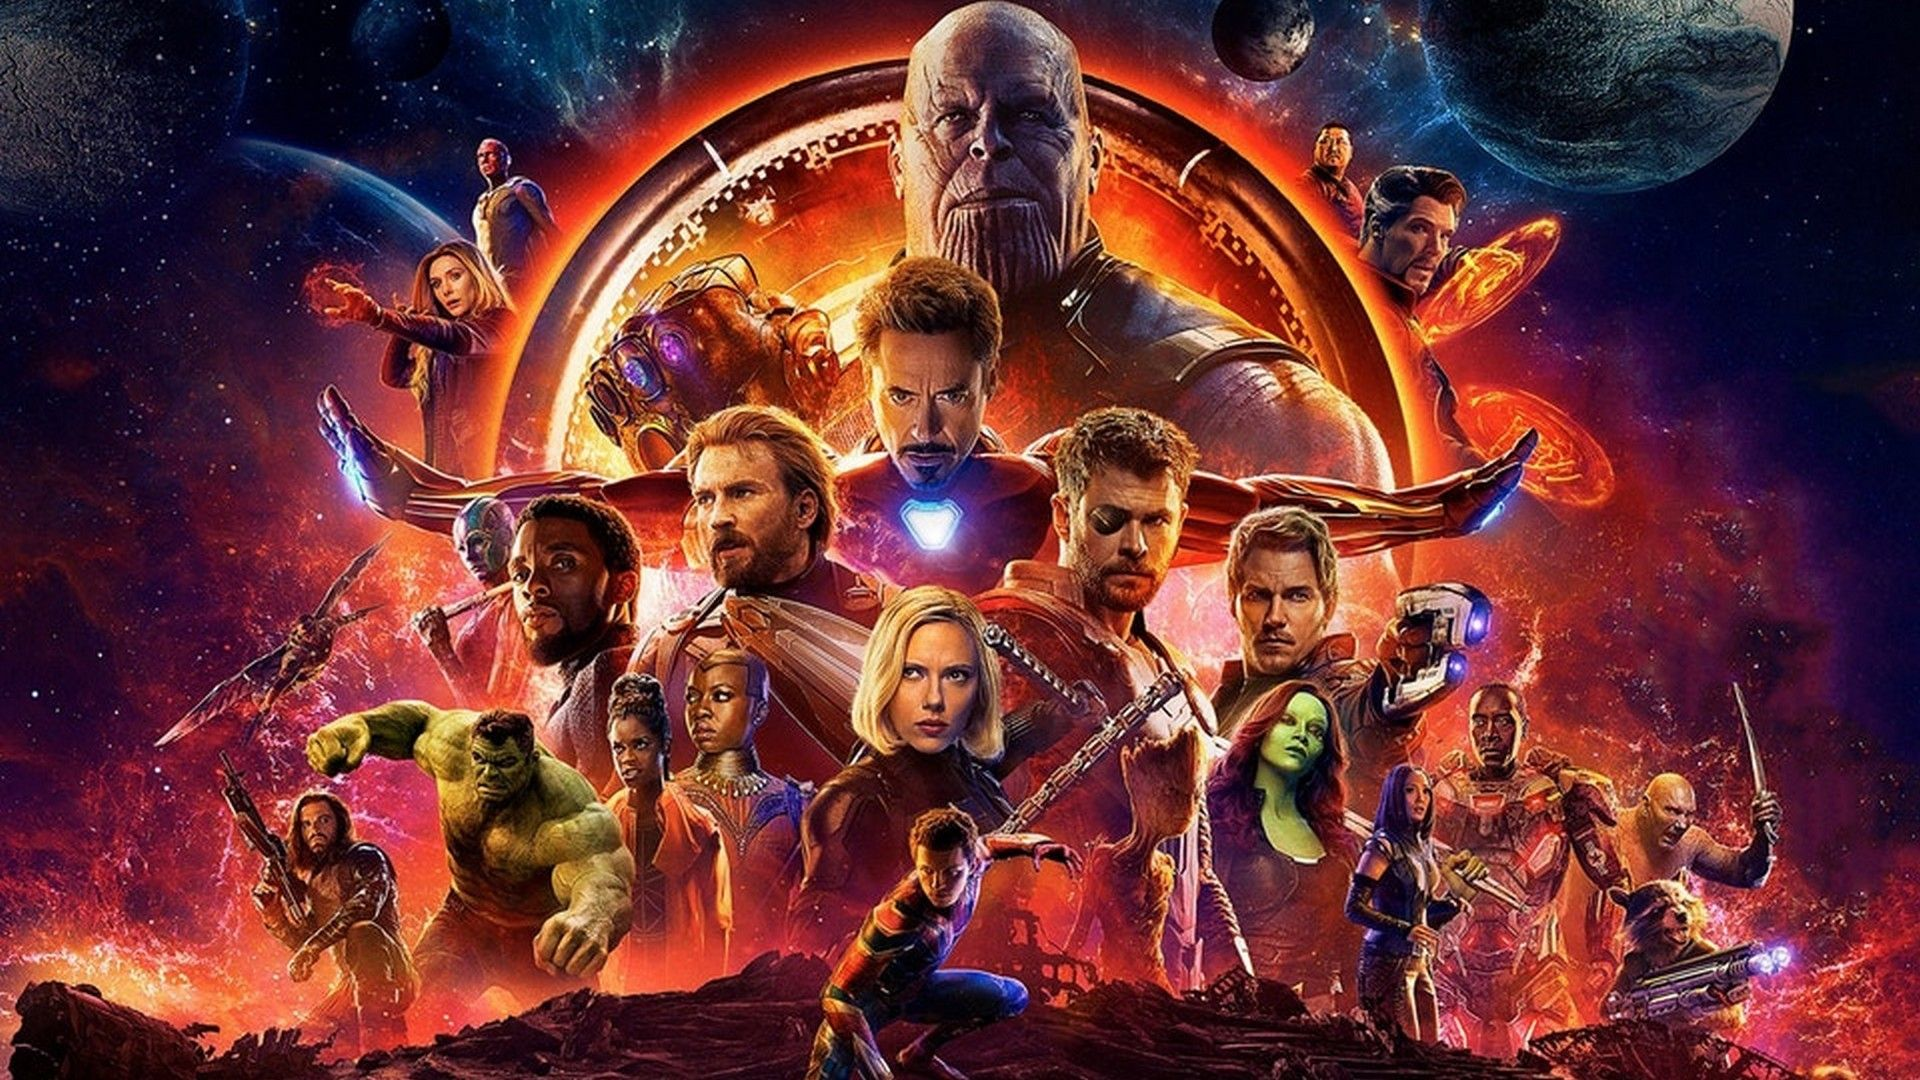 Wallpaper Hd Avengers Infinity War 2021 Live Wallpaper Hd Marvel Movies In Order Marvel Cinematic Universe Movies Avengers Infinity War